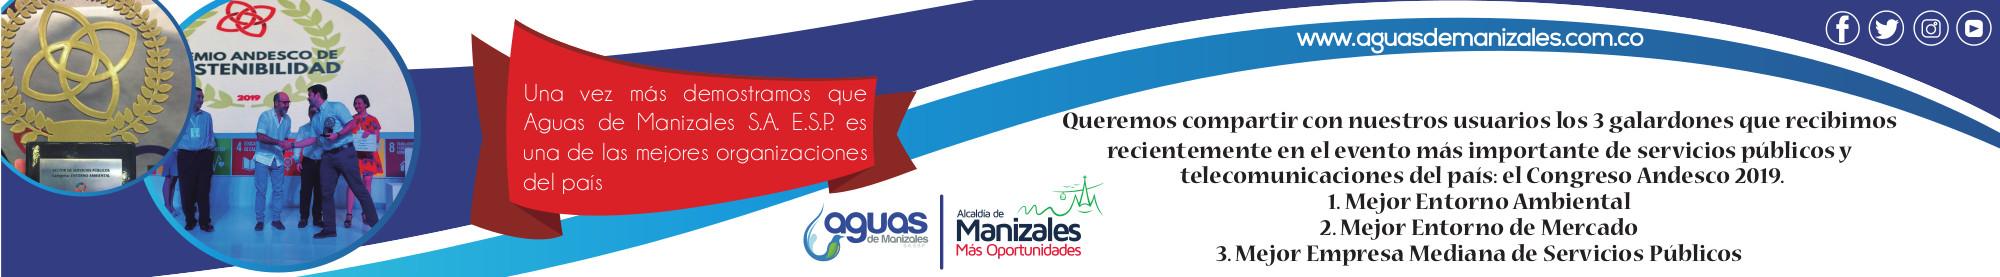 Aguas de Manizales. Banner mes de agosto.